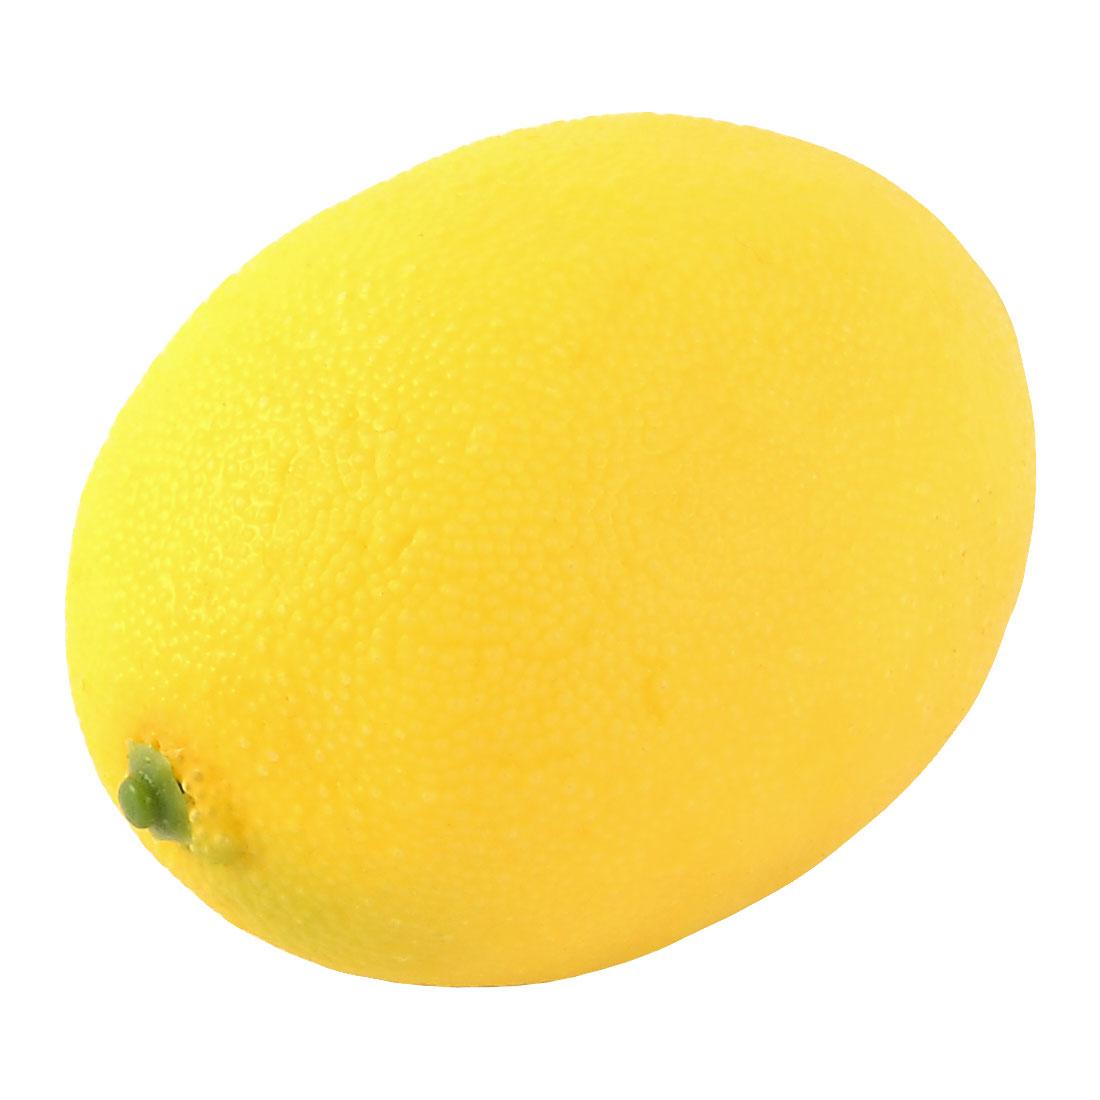 Artificial Fruit Plastic Lifelike Decoration Handmade Simulation Lemon Yellow